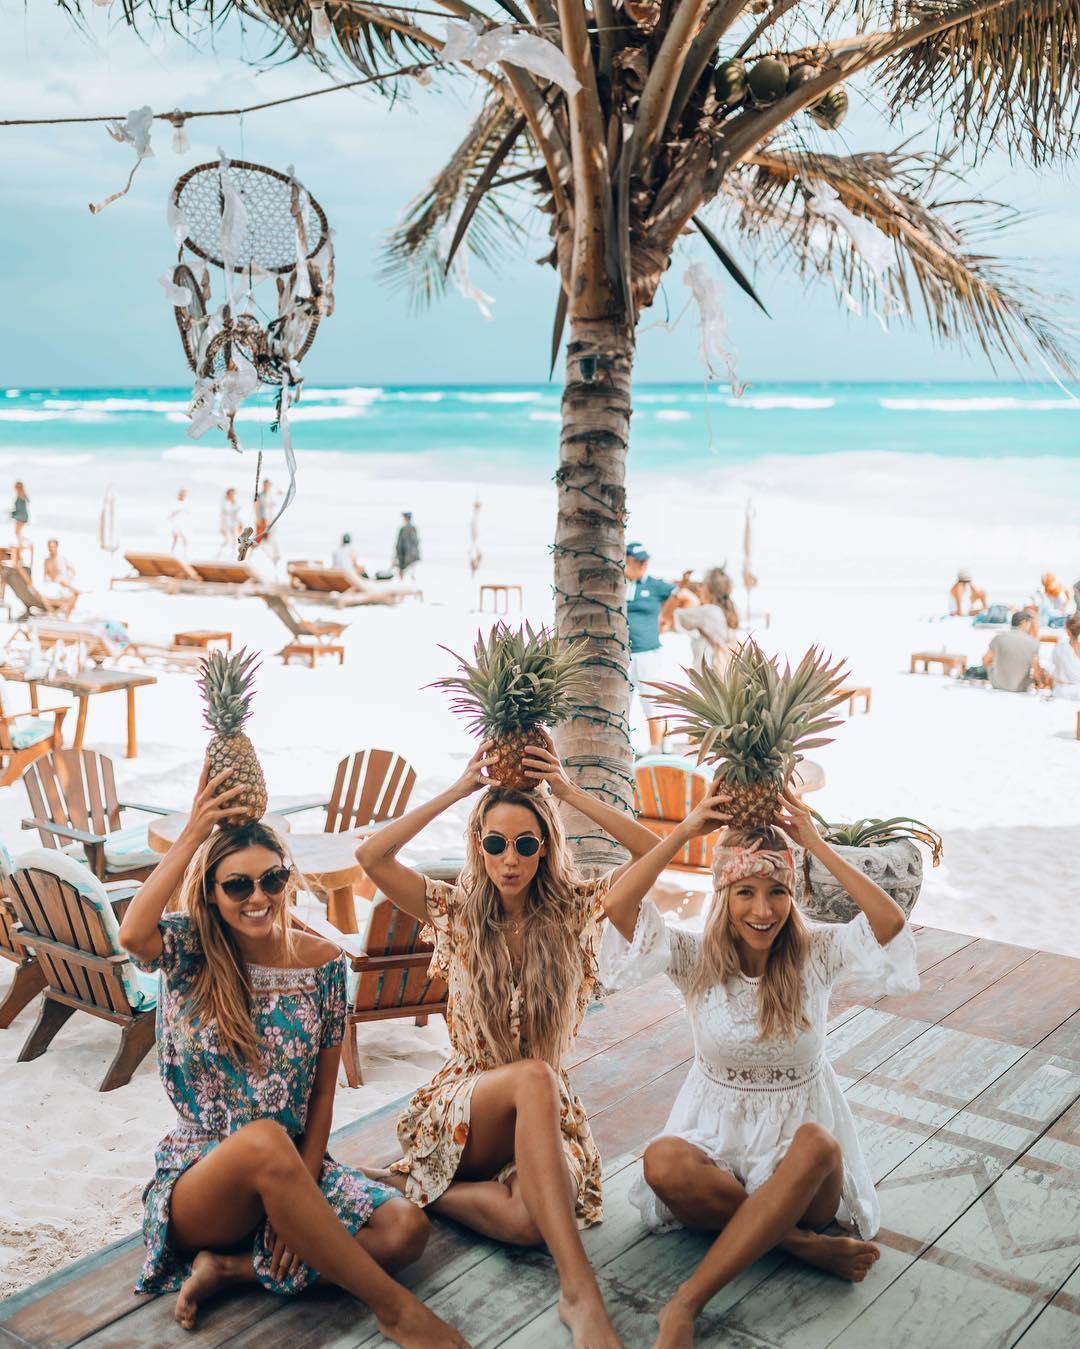 Tulum, Quintana Roo, credits to @meg_legs , @travel_inhershoes, @zeebalife on Instagram